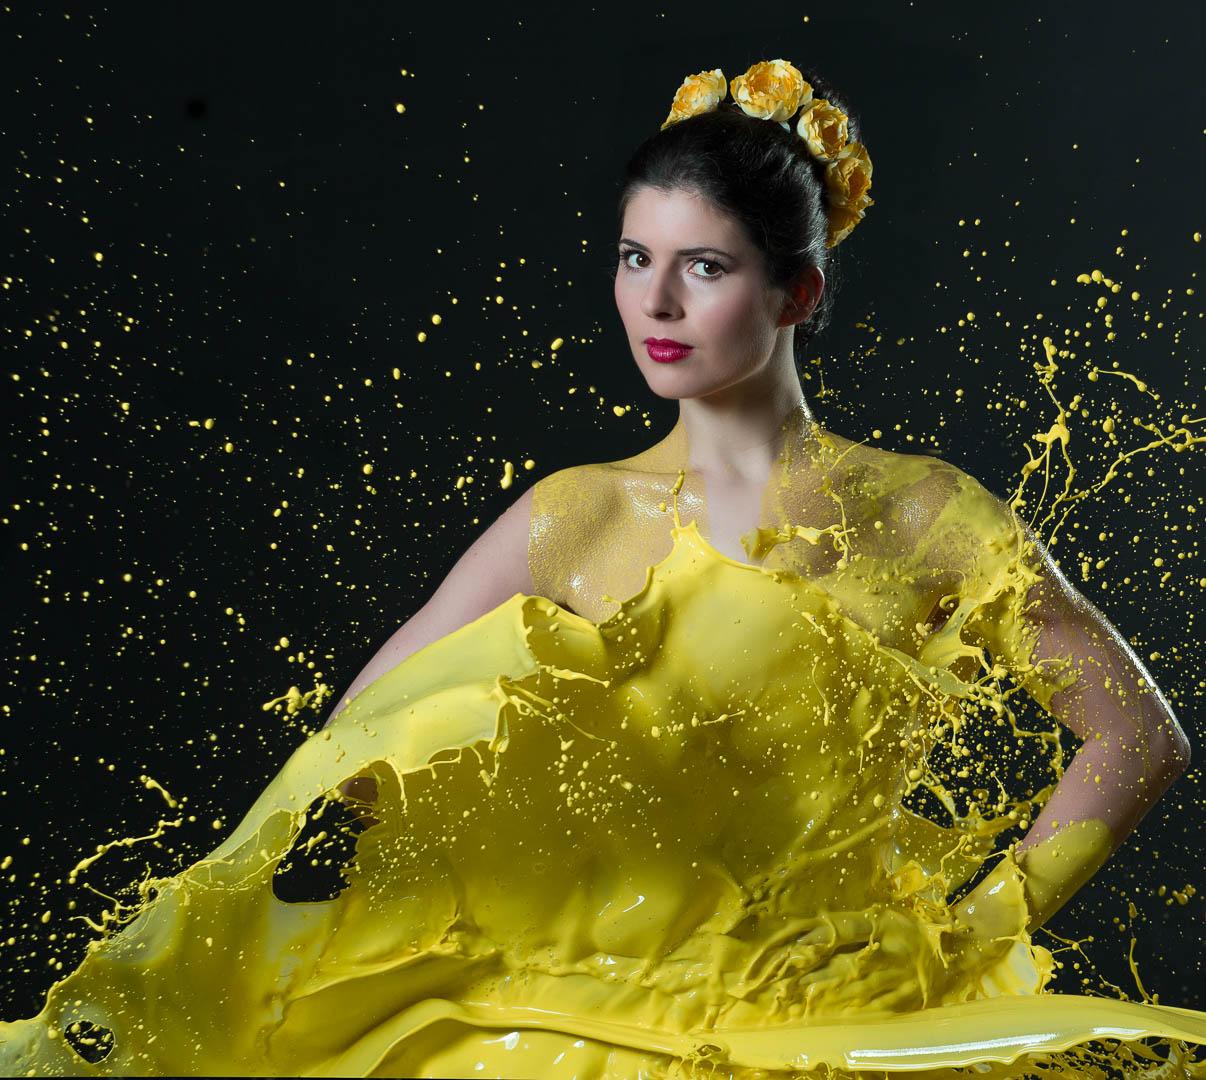 Fotograf-Fotostudio-Dresden-Shooting-Milch-Farbe-Gelb-Kopfschmuck-Kleid-Fließend-Akt-Make up